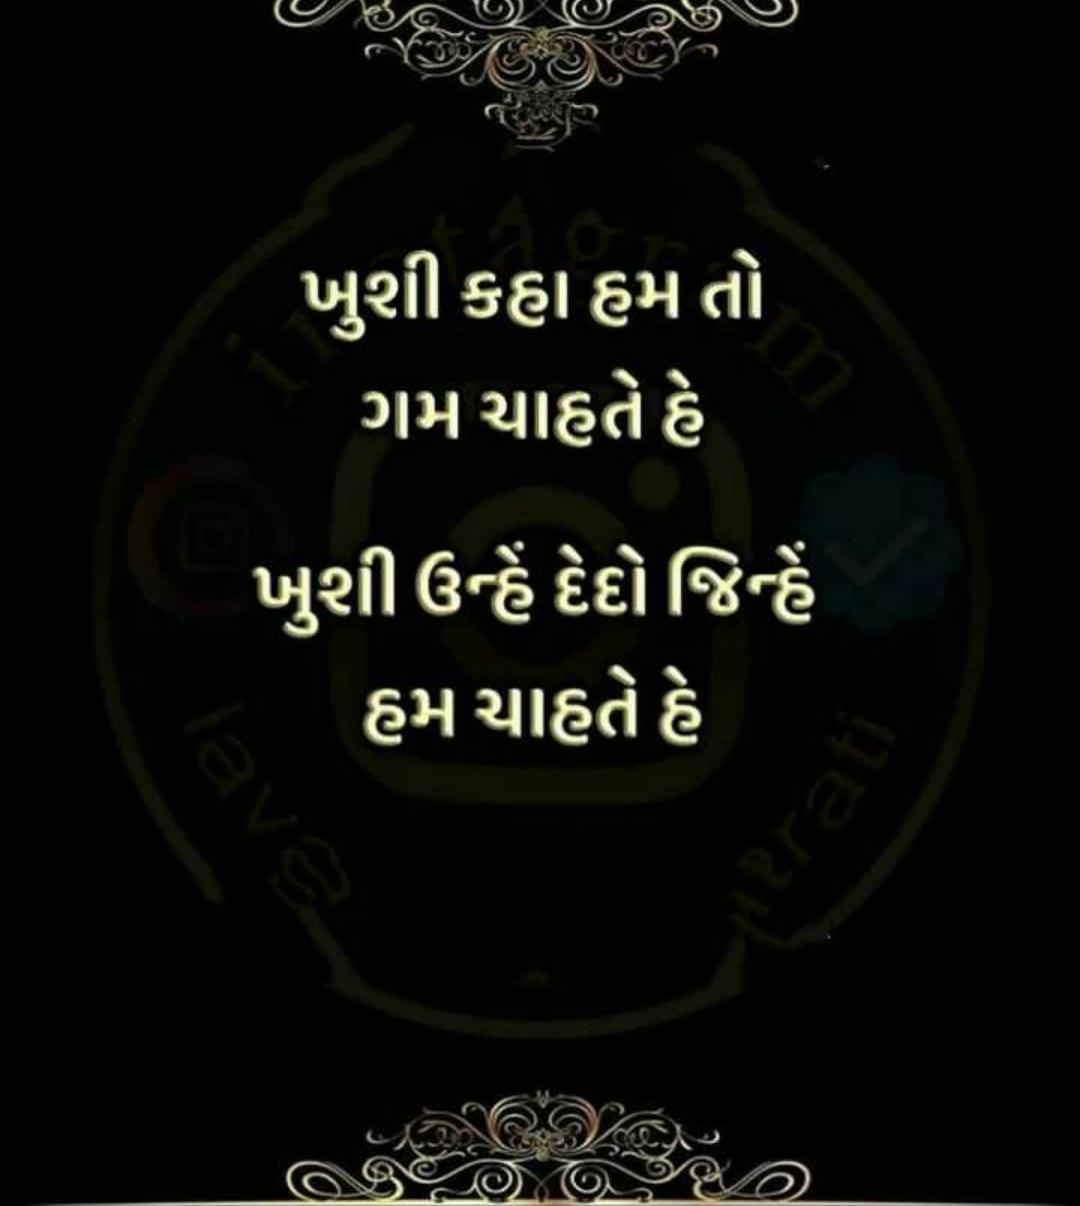 suvichar-in-gujarati-status-14.jpg